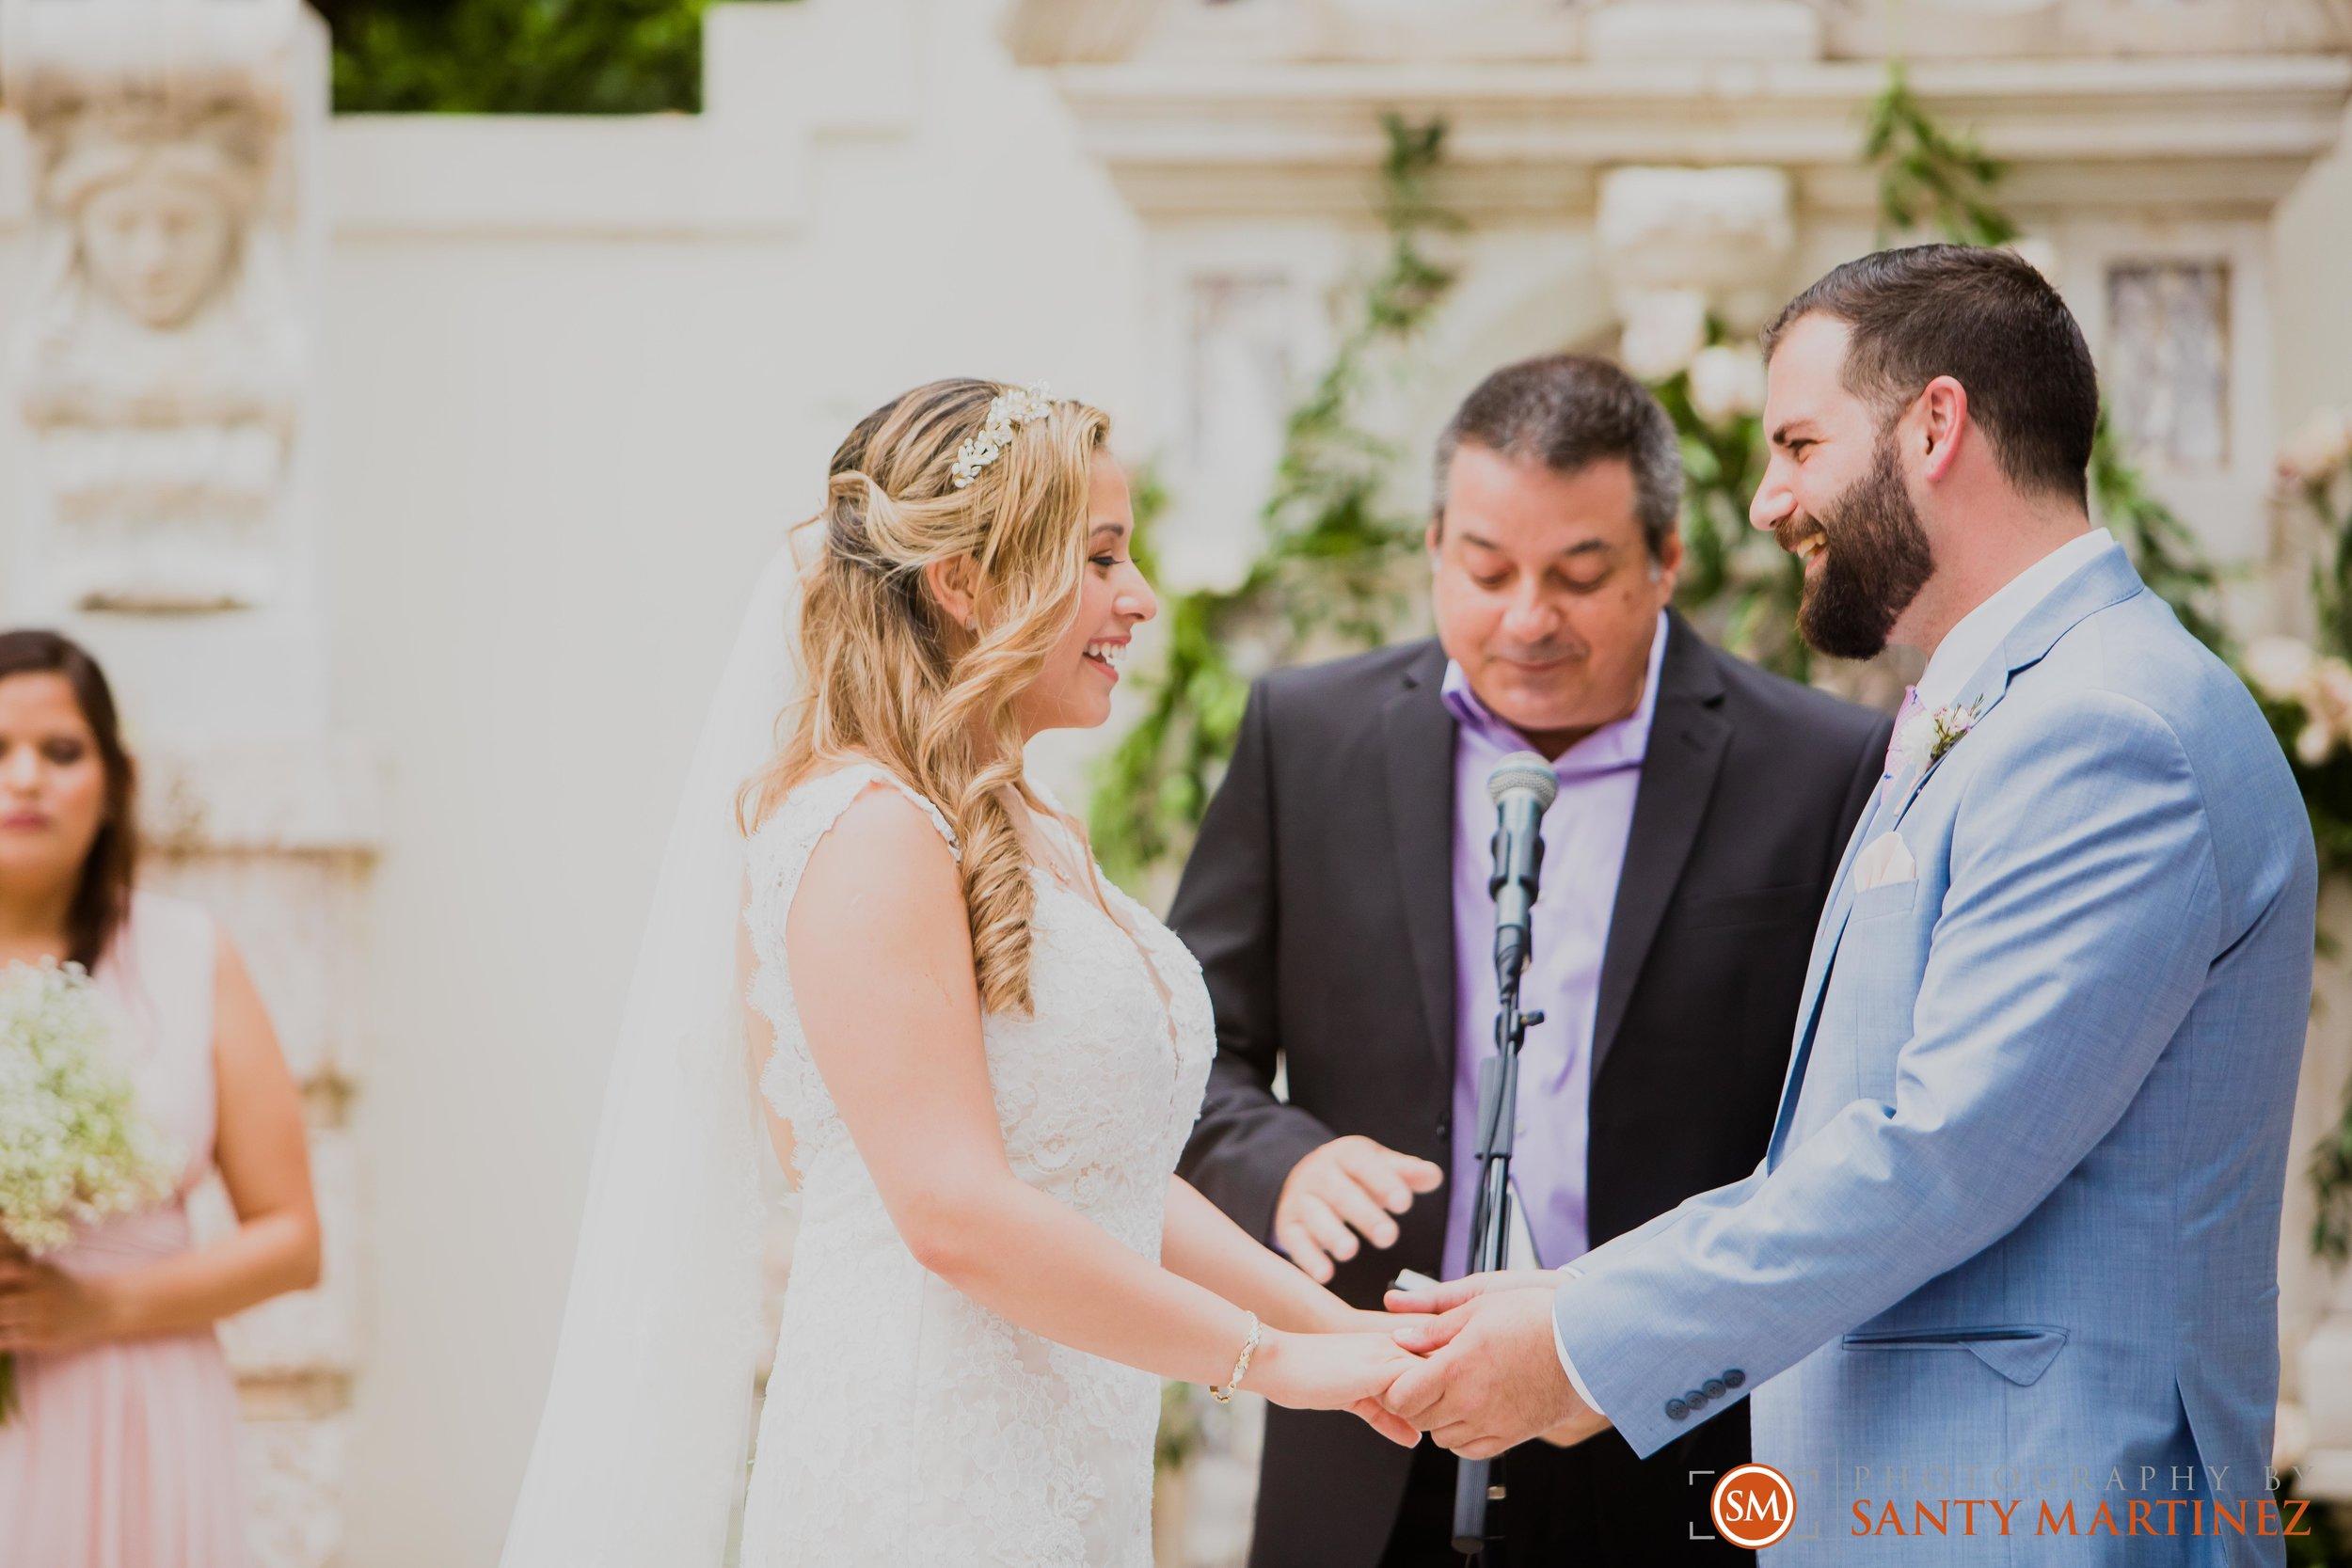 Wedding Bonnet House - Santy Martinez Photography-33.jpg